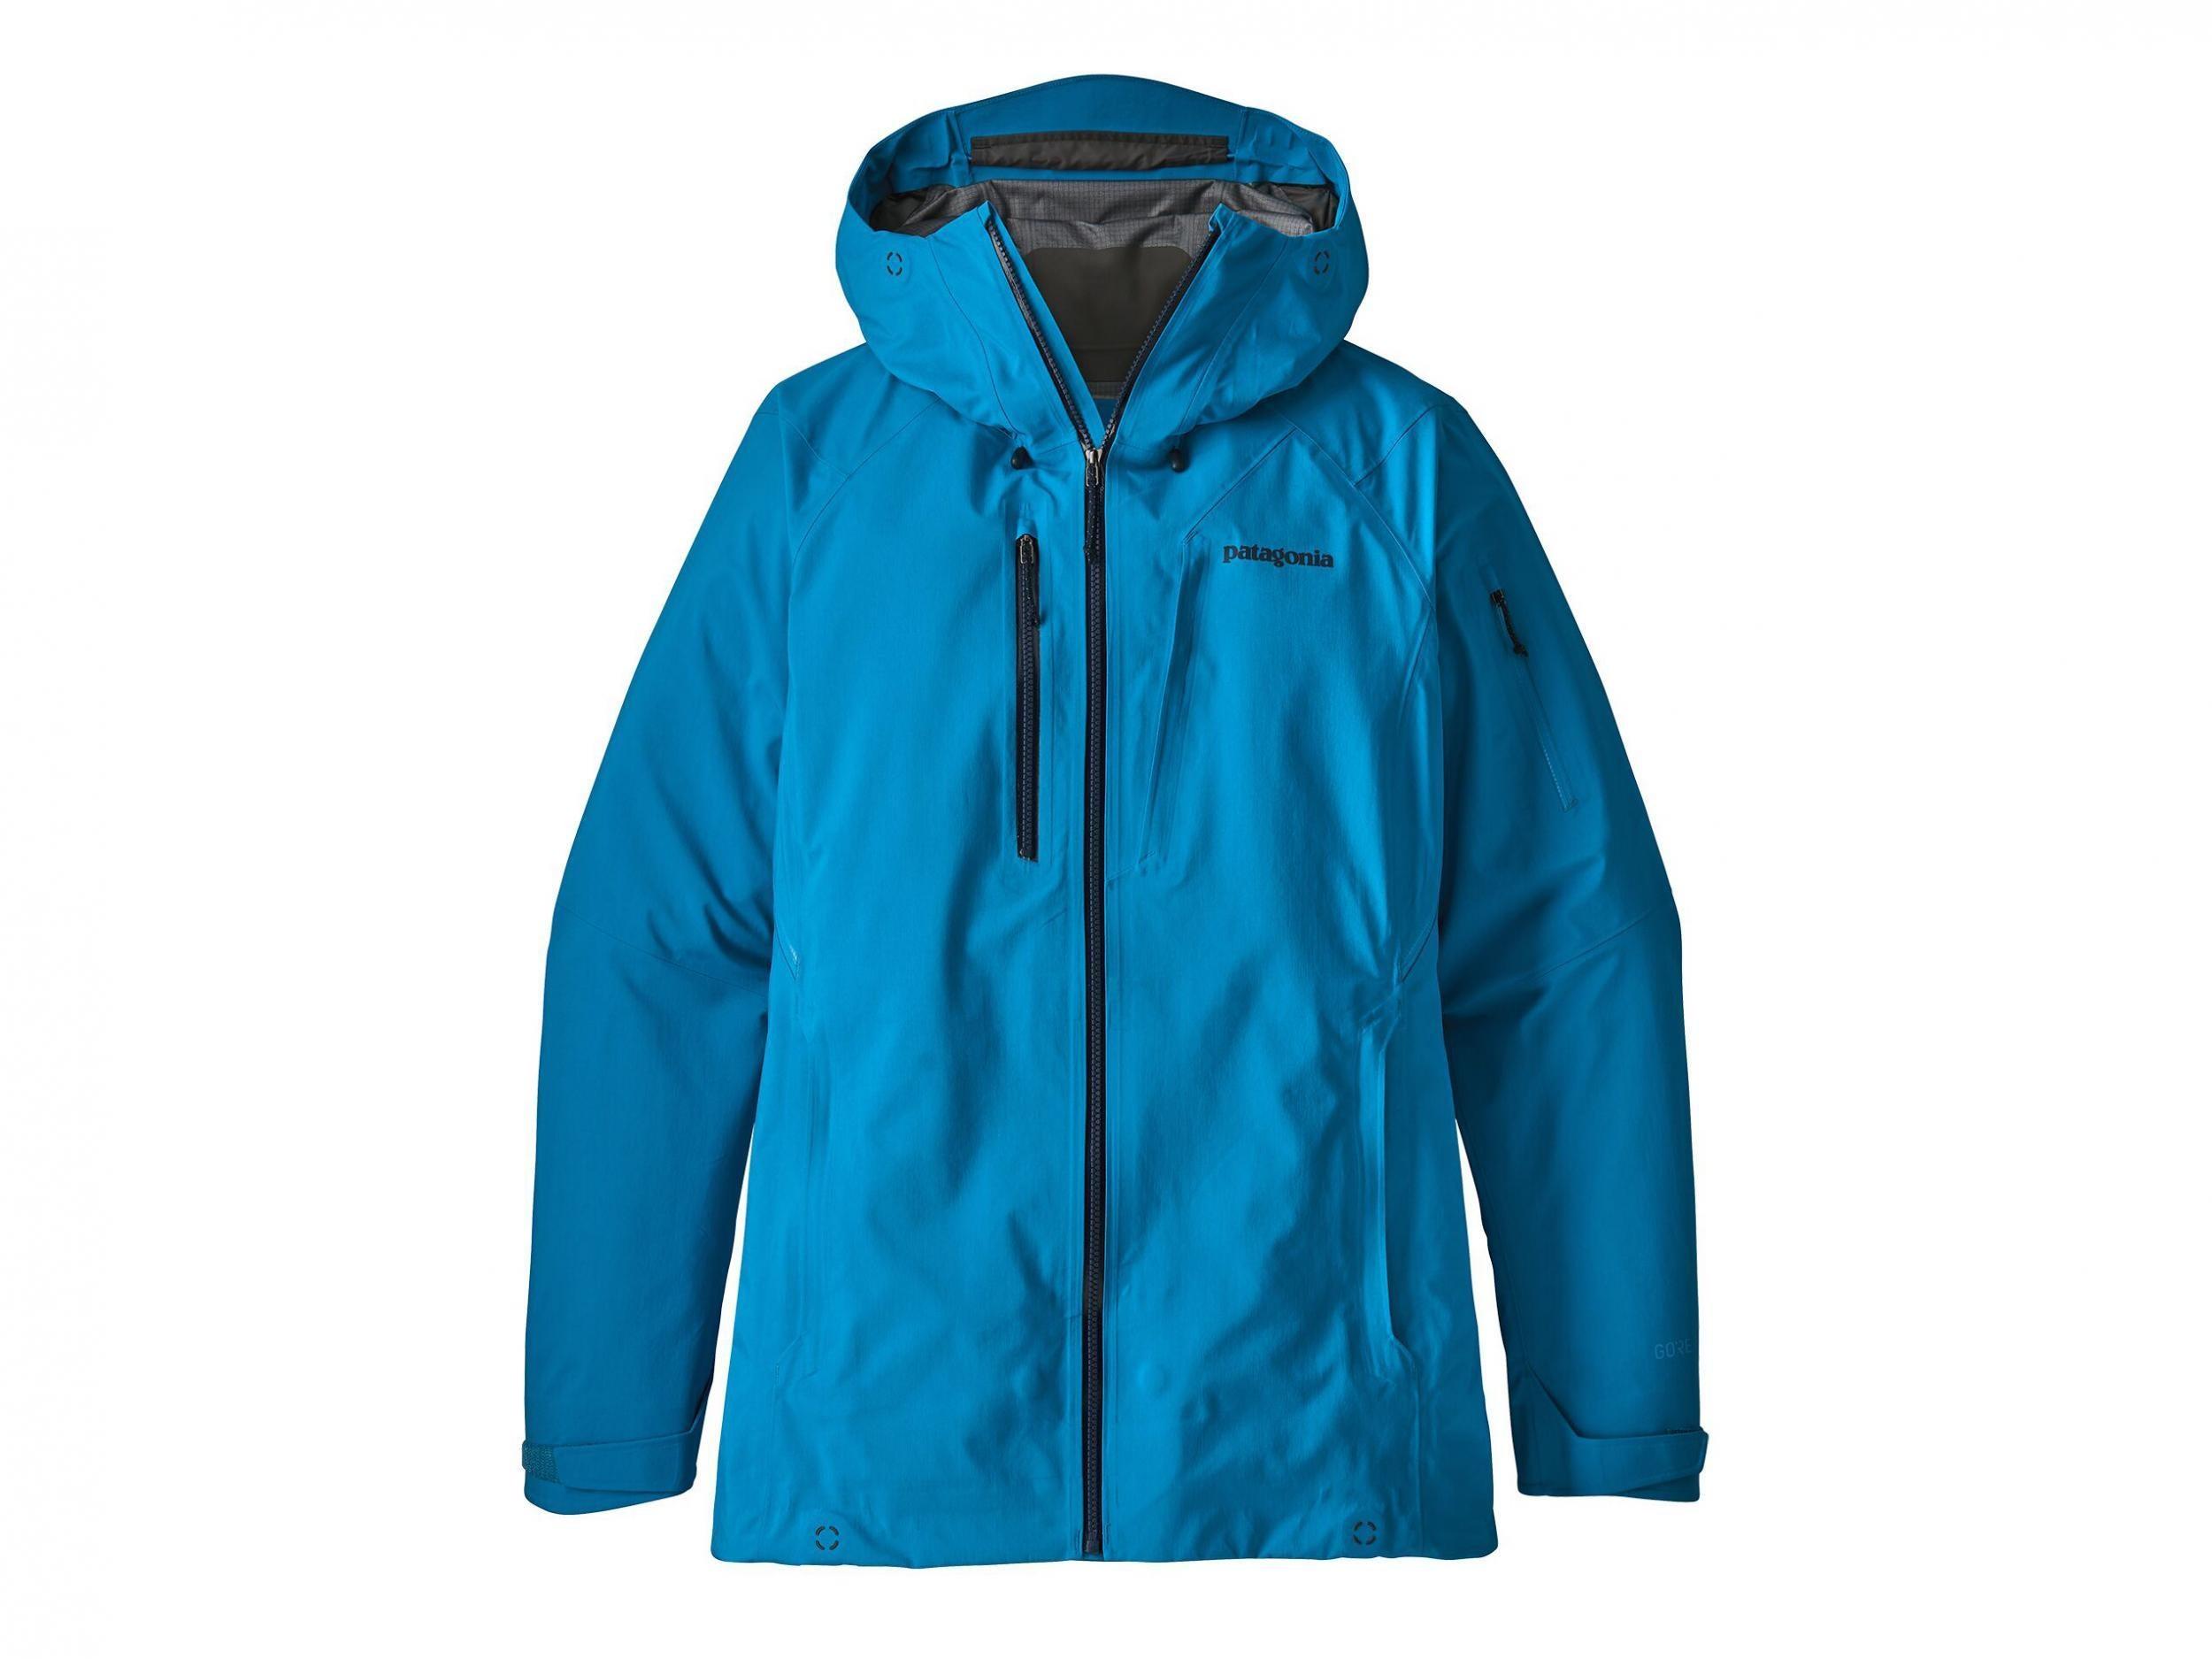 Salomon Fantasy Jacket Men's Ski Jacket Snowboard Jacket Winter Jacket New   eBay